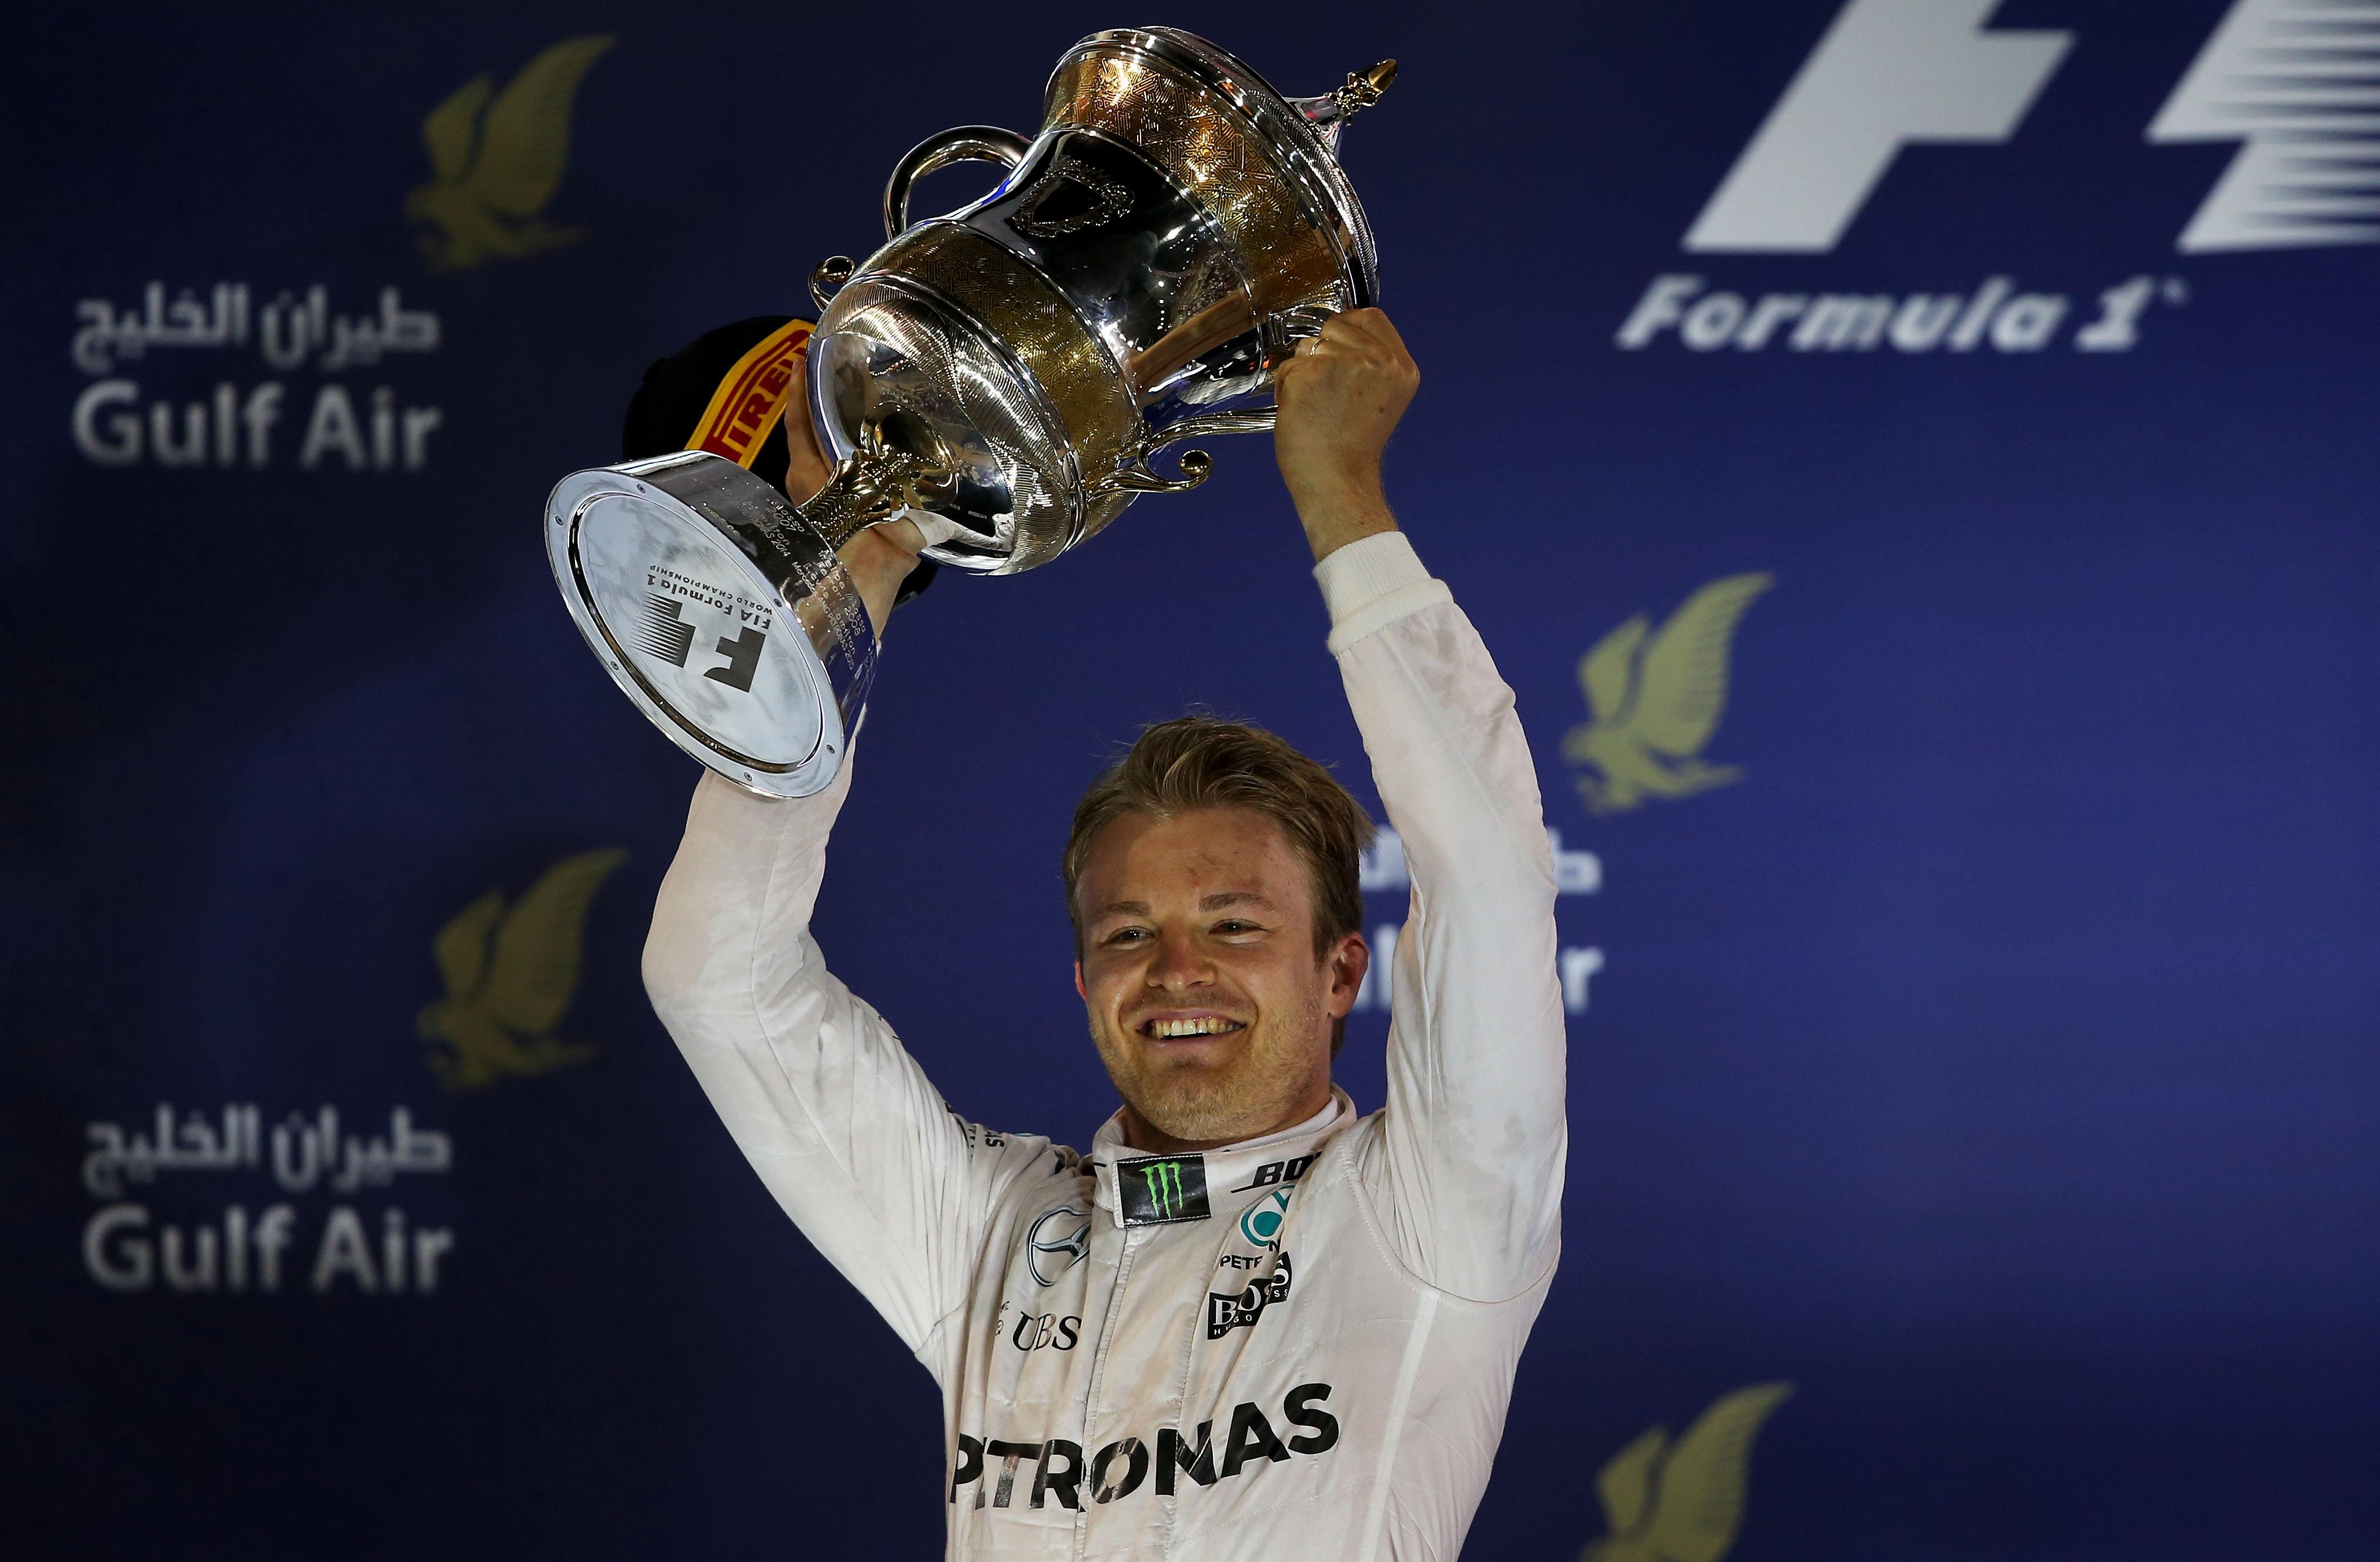 Nico Rosberg festeggia la vittoria in Bahrain